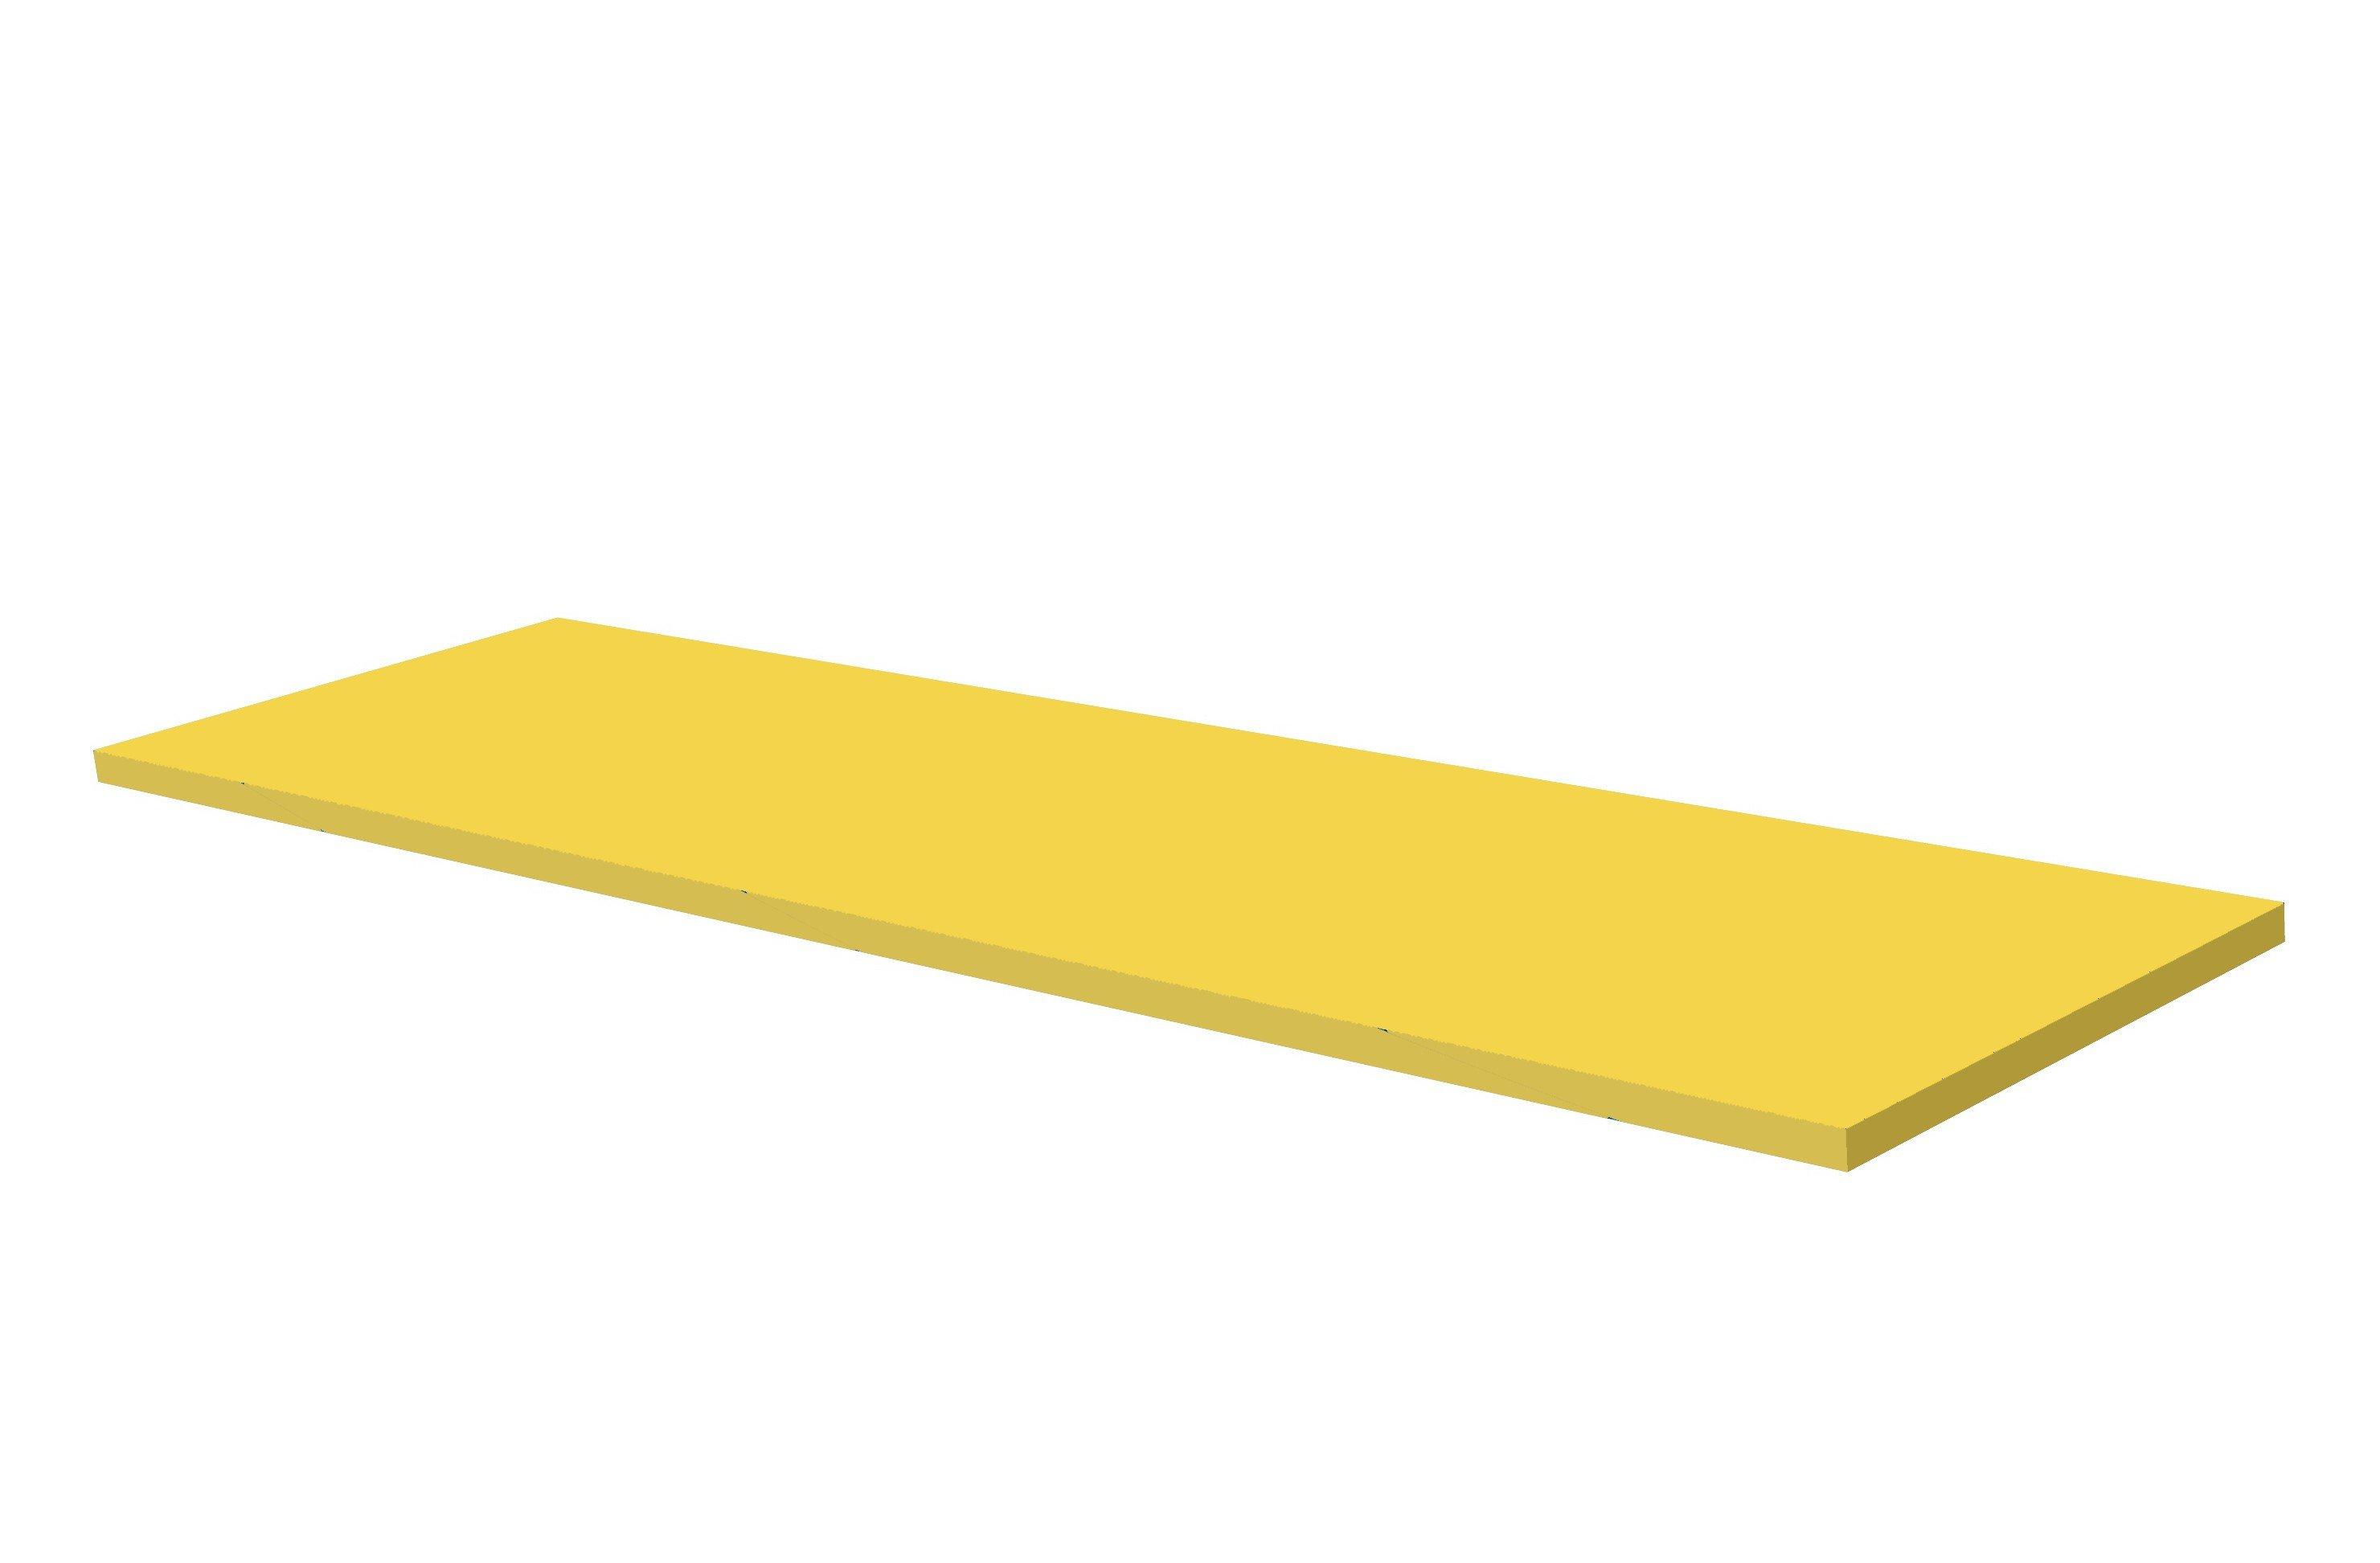 Yellow rubber sheet